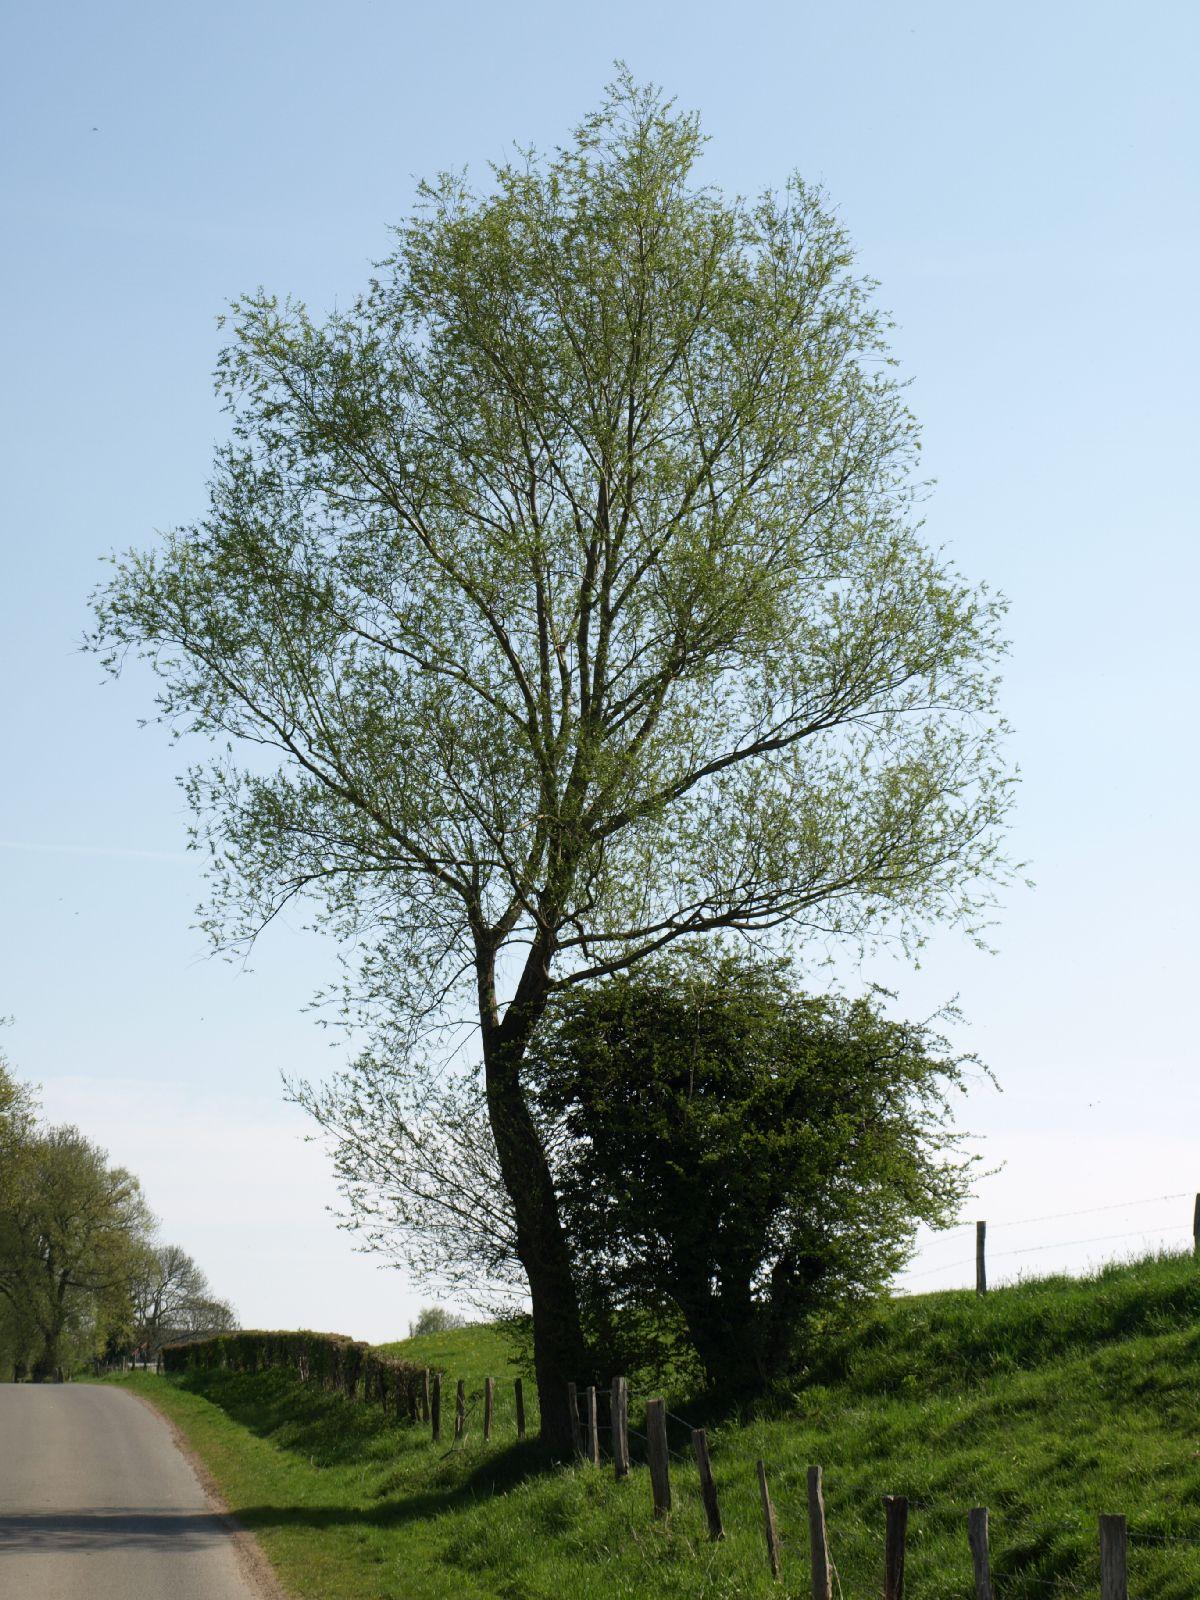 Pflanzen-Baum-Foto_Textur_B_P5042392